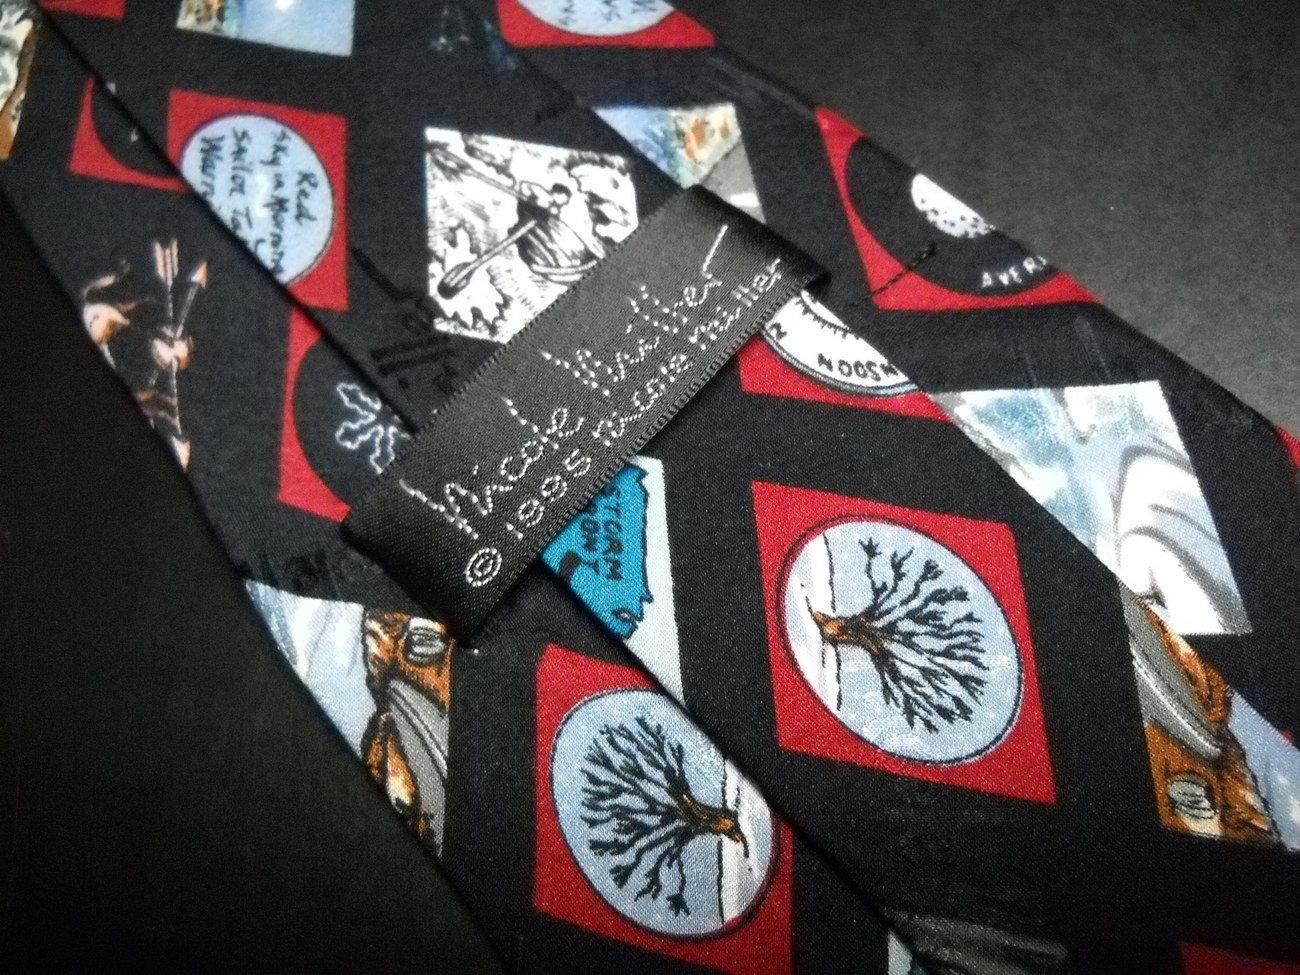 Nicole Miller Neck Tie Hand Sewn 1995 Weather Season Symbols Icons Silk Black